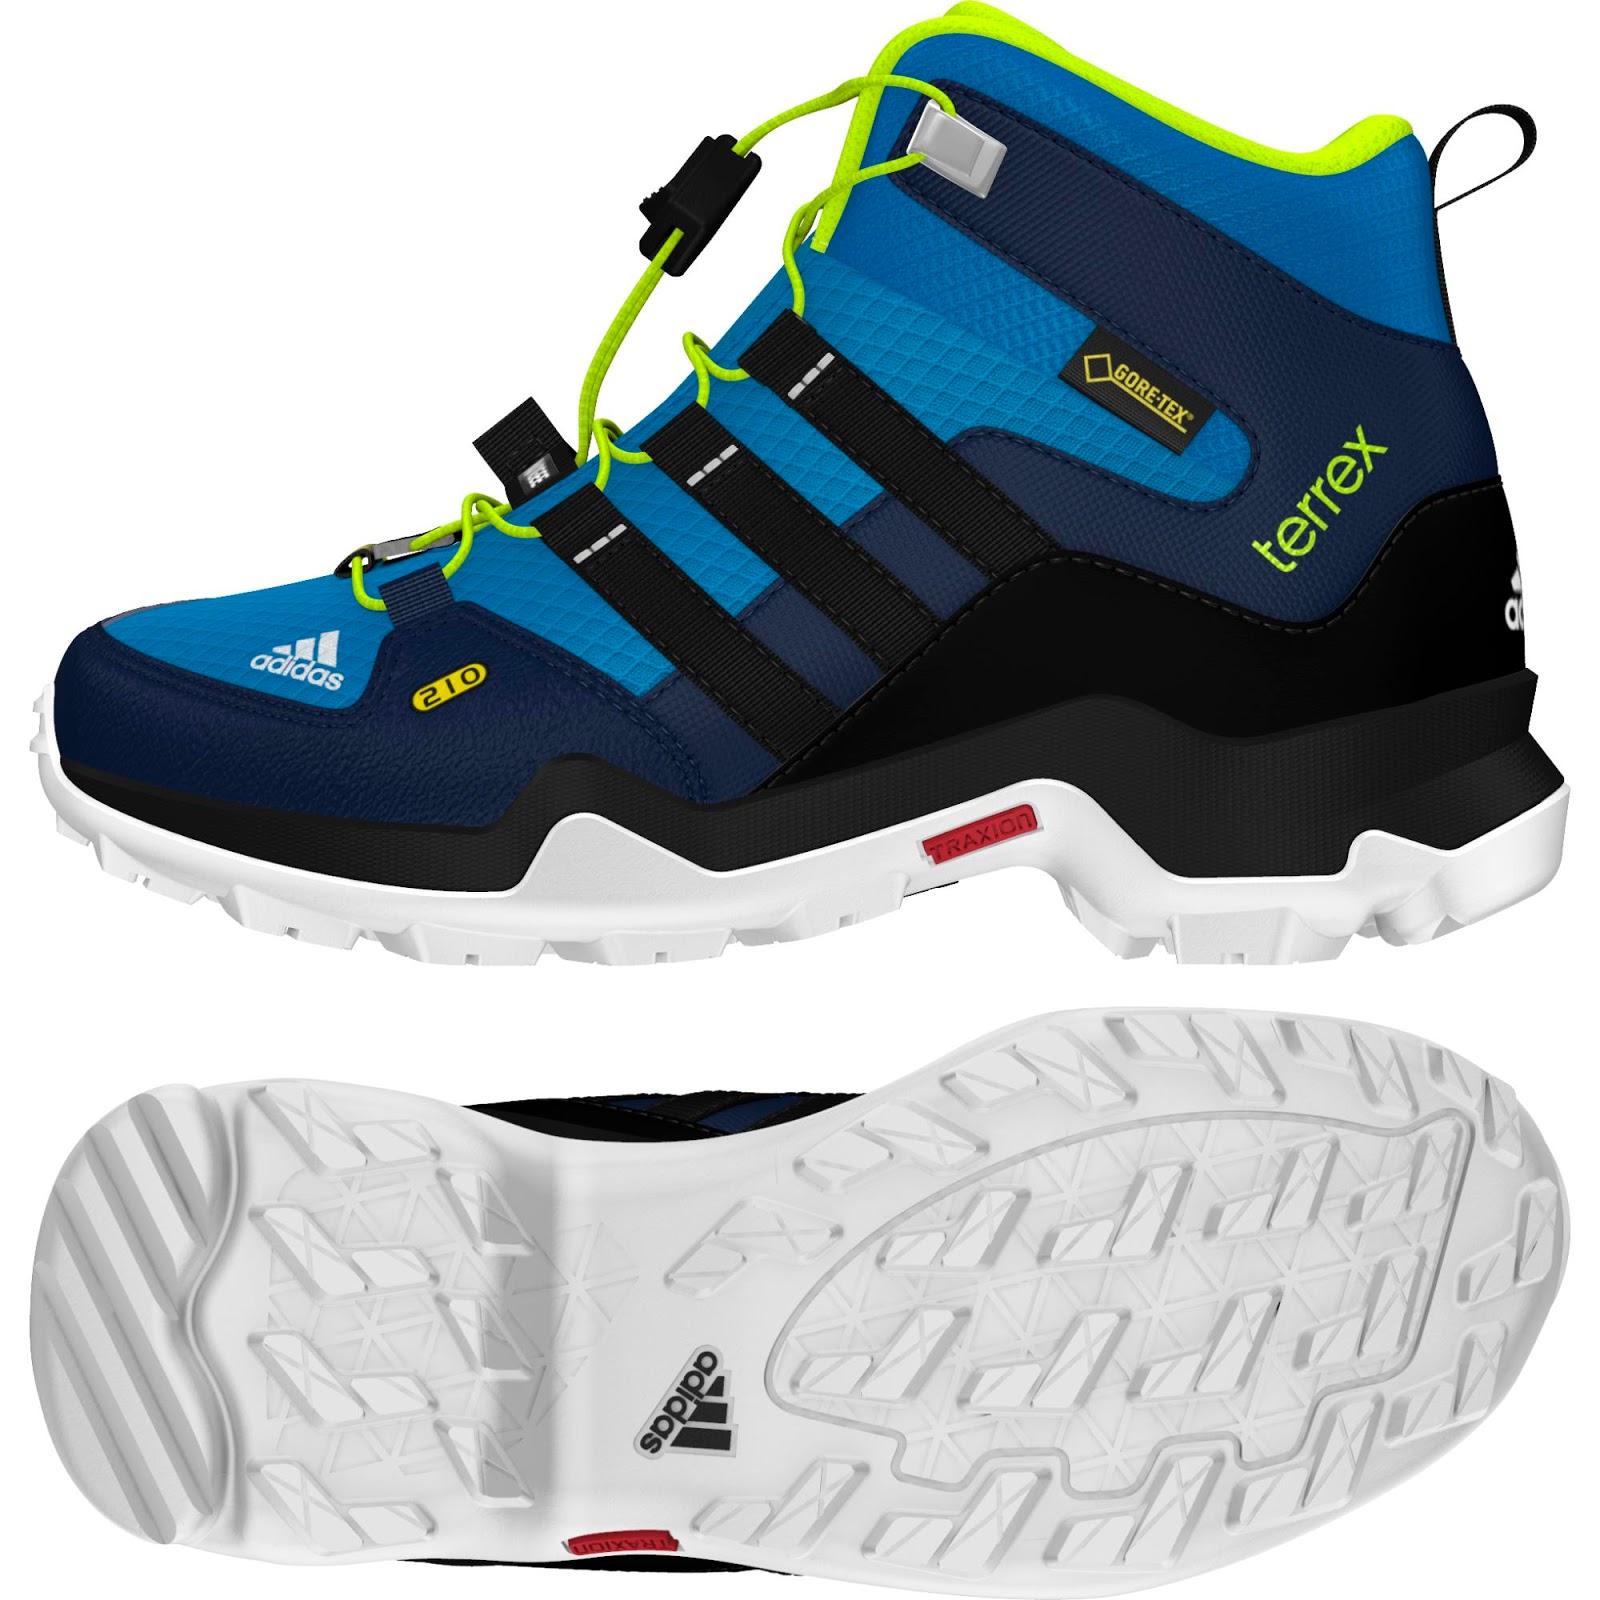 c6fdf597 zapatillas impermeables nino,+8000 TEWIN JR Zapatillas montana impermeables  nino